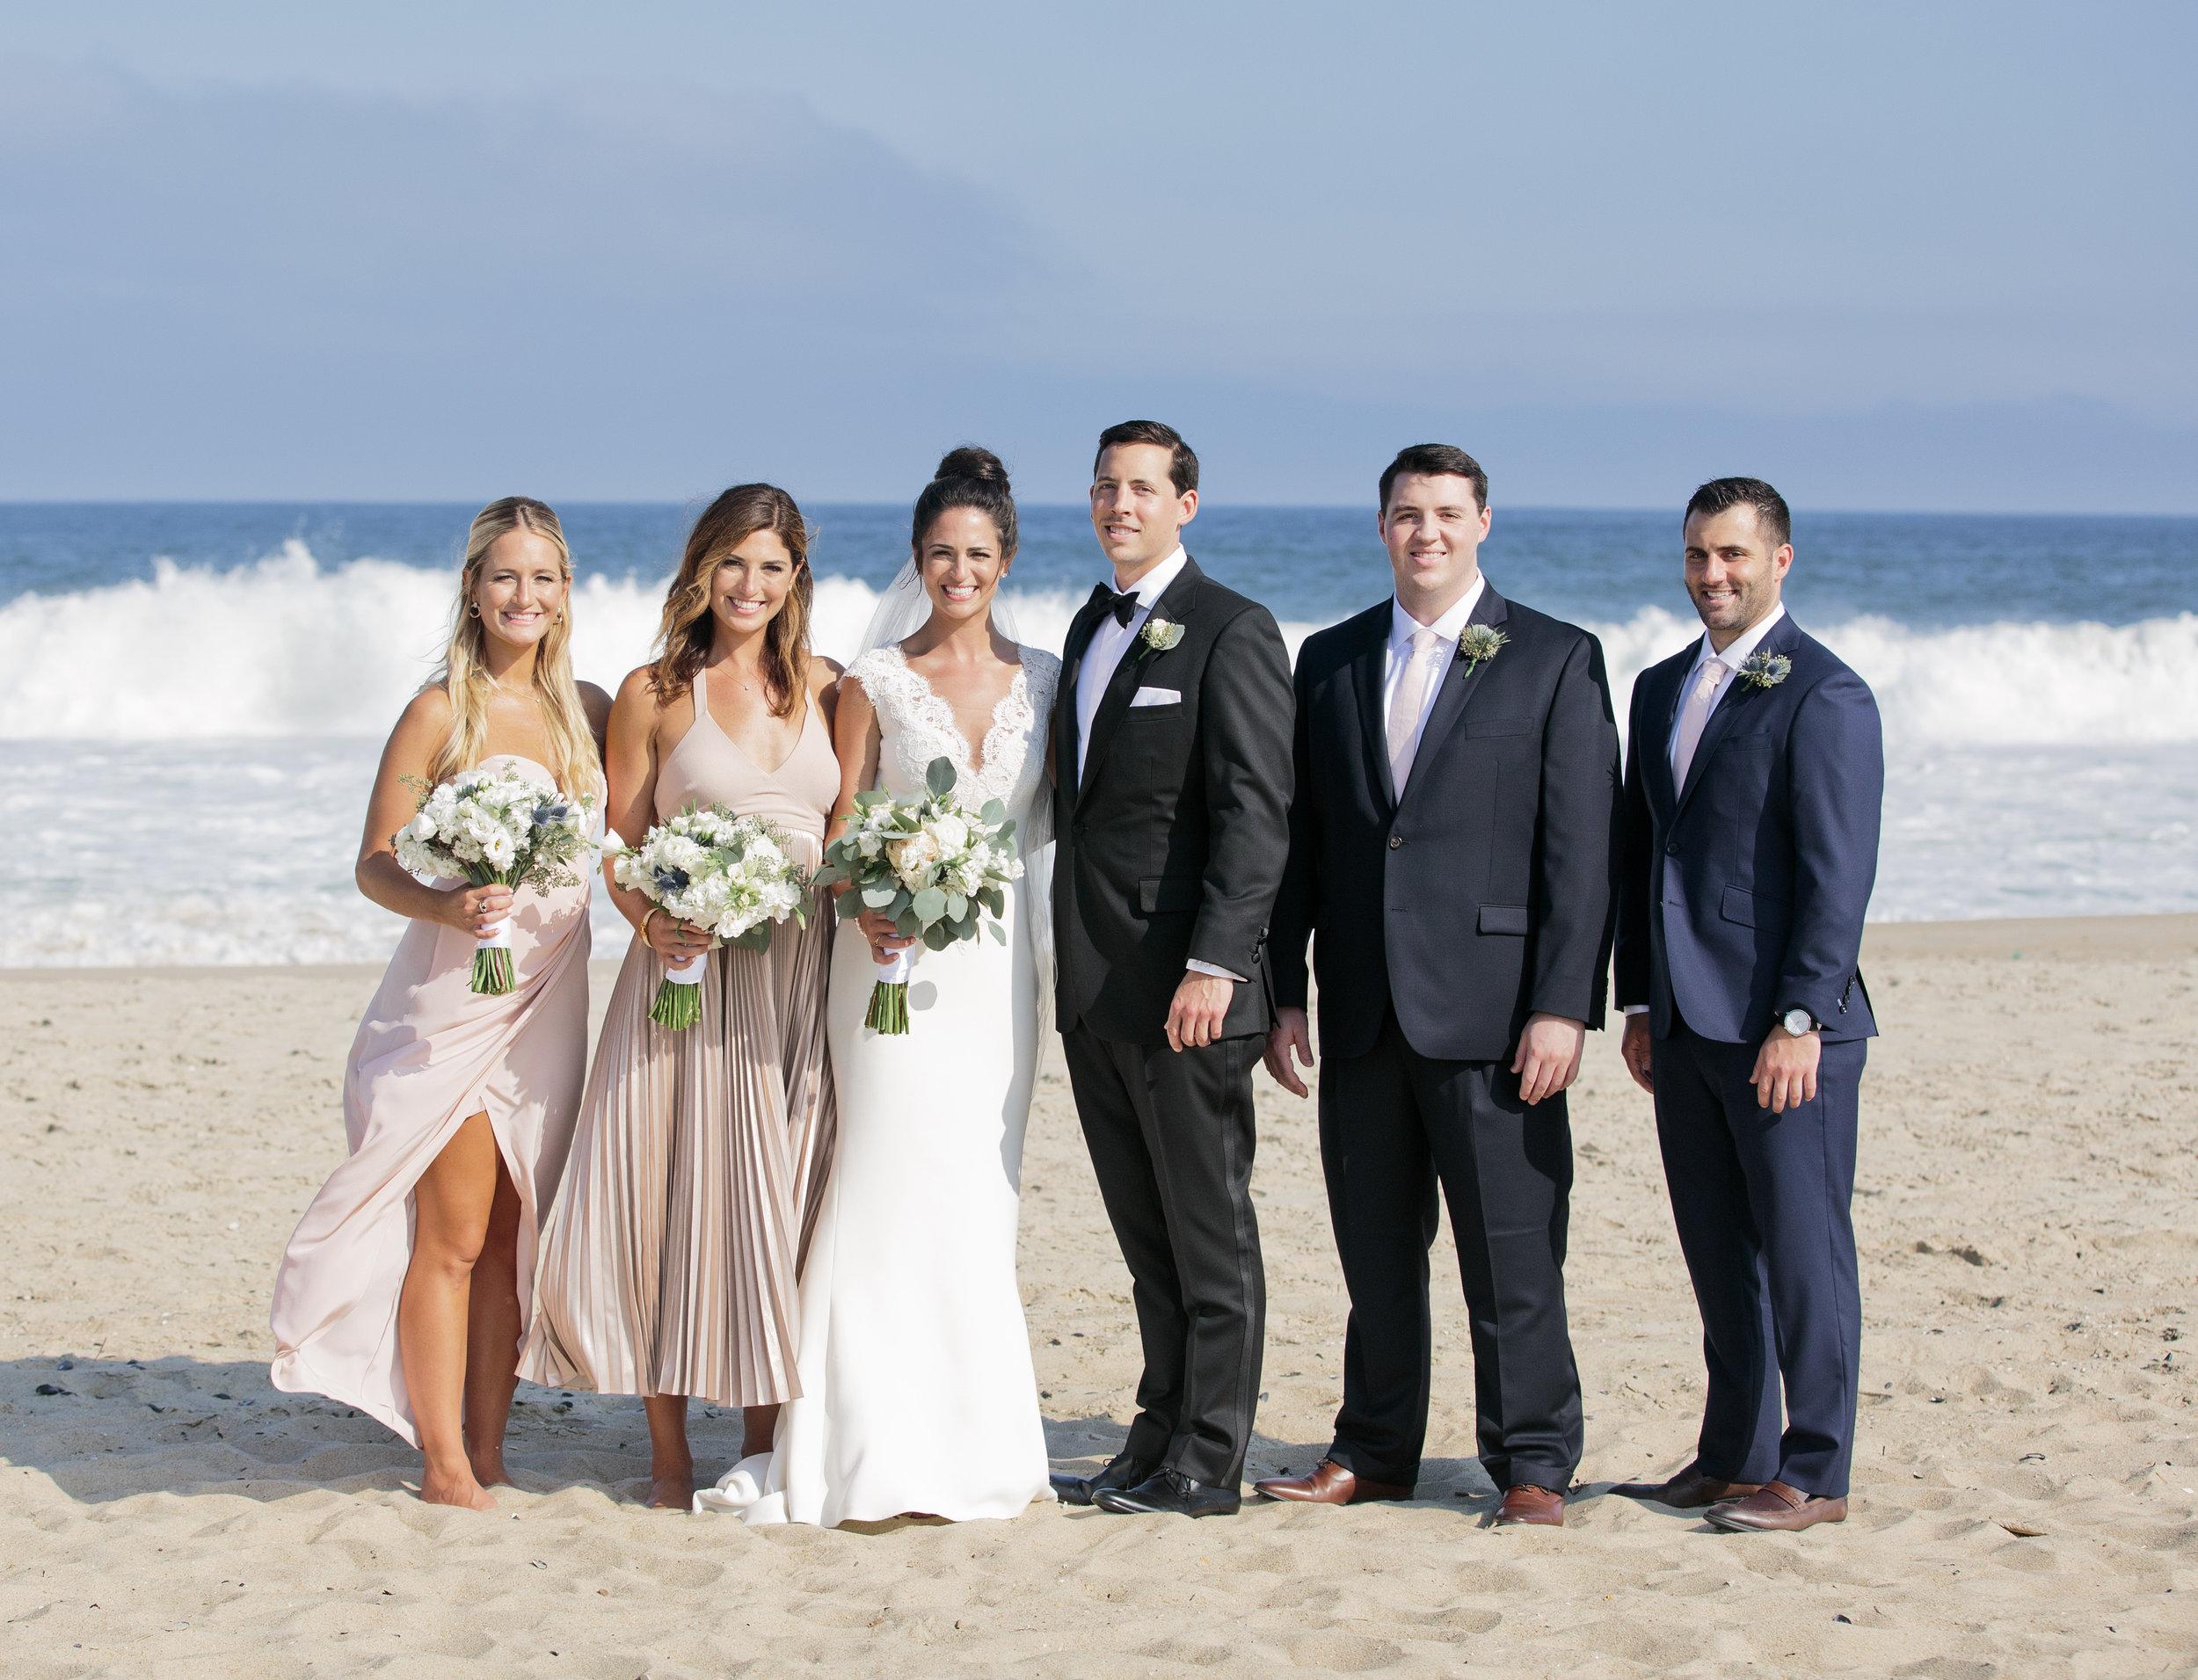 Spring-Lake-New-Jersey-Beach-Wedding-Photographer_157.jpg